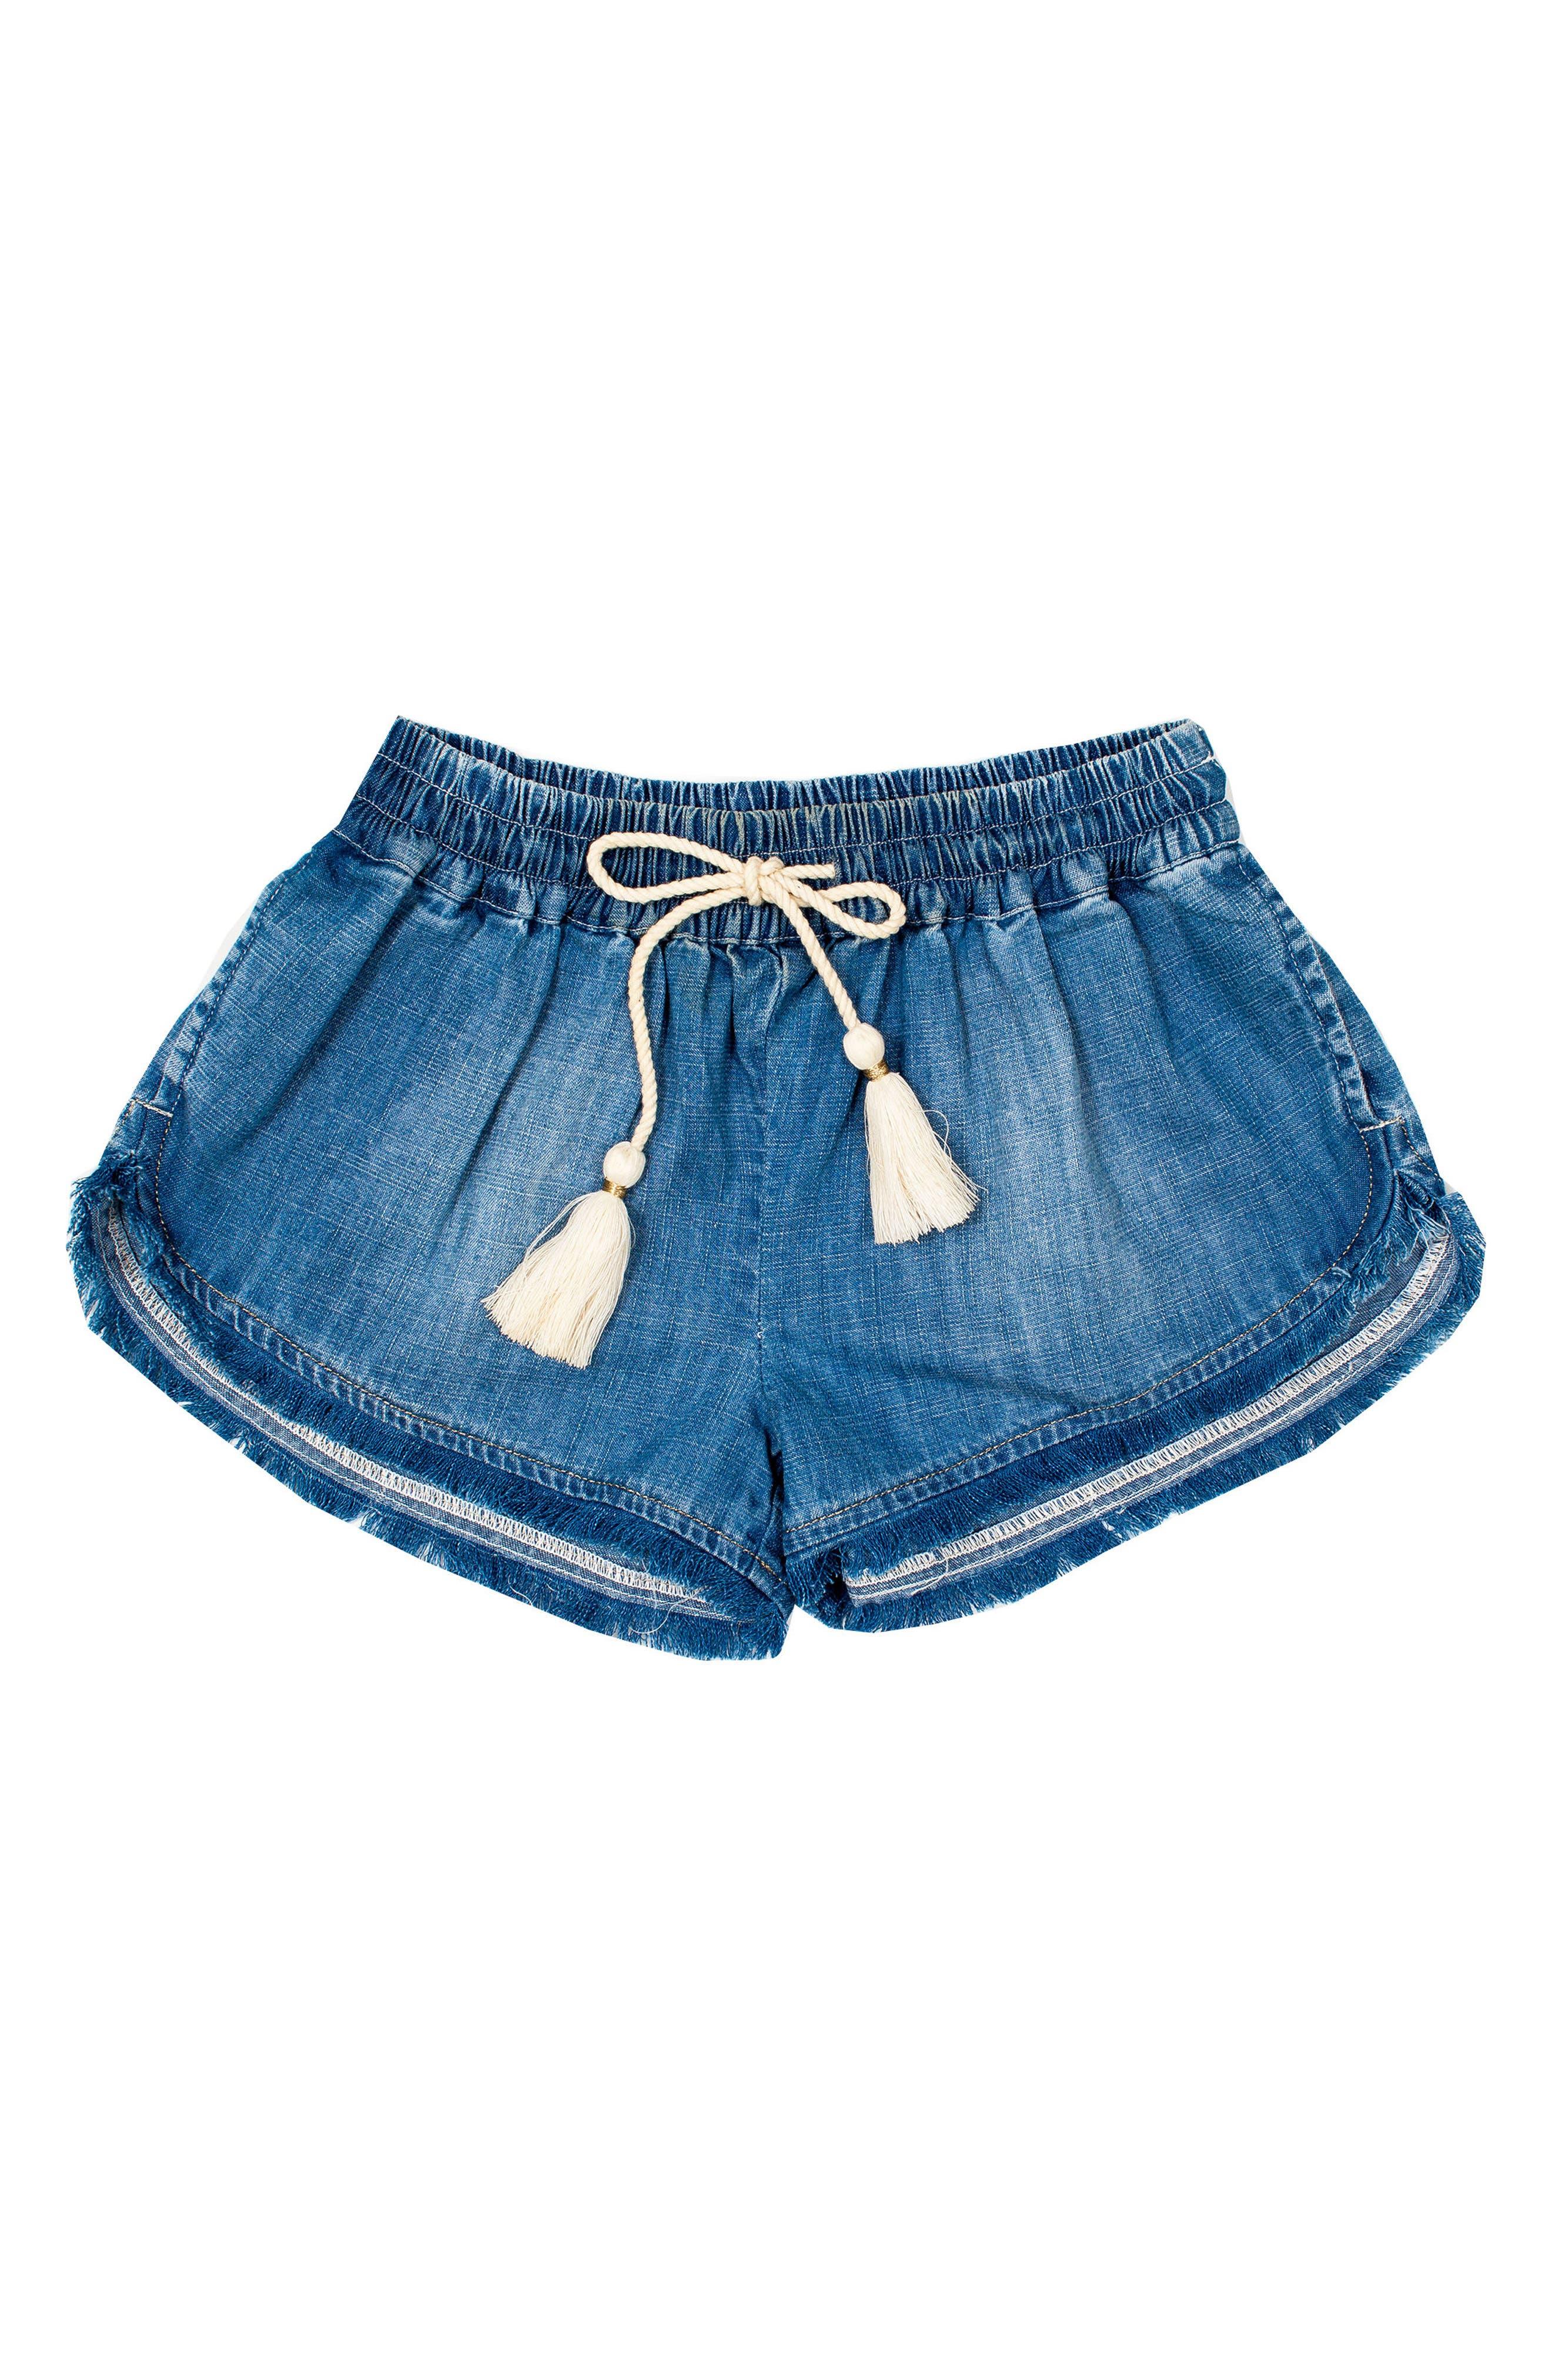 BOWIE X JAMES Frayed Denim Shorts (Toddler Girls, Little Girls & Big Girls)